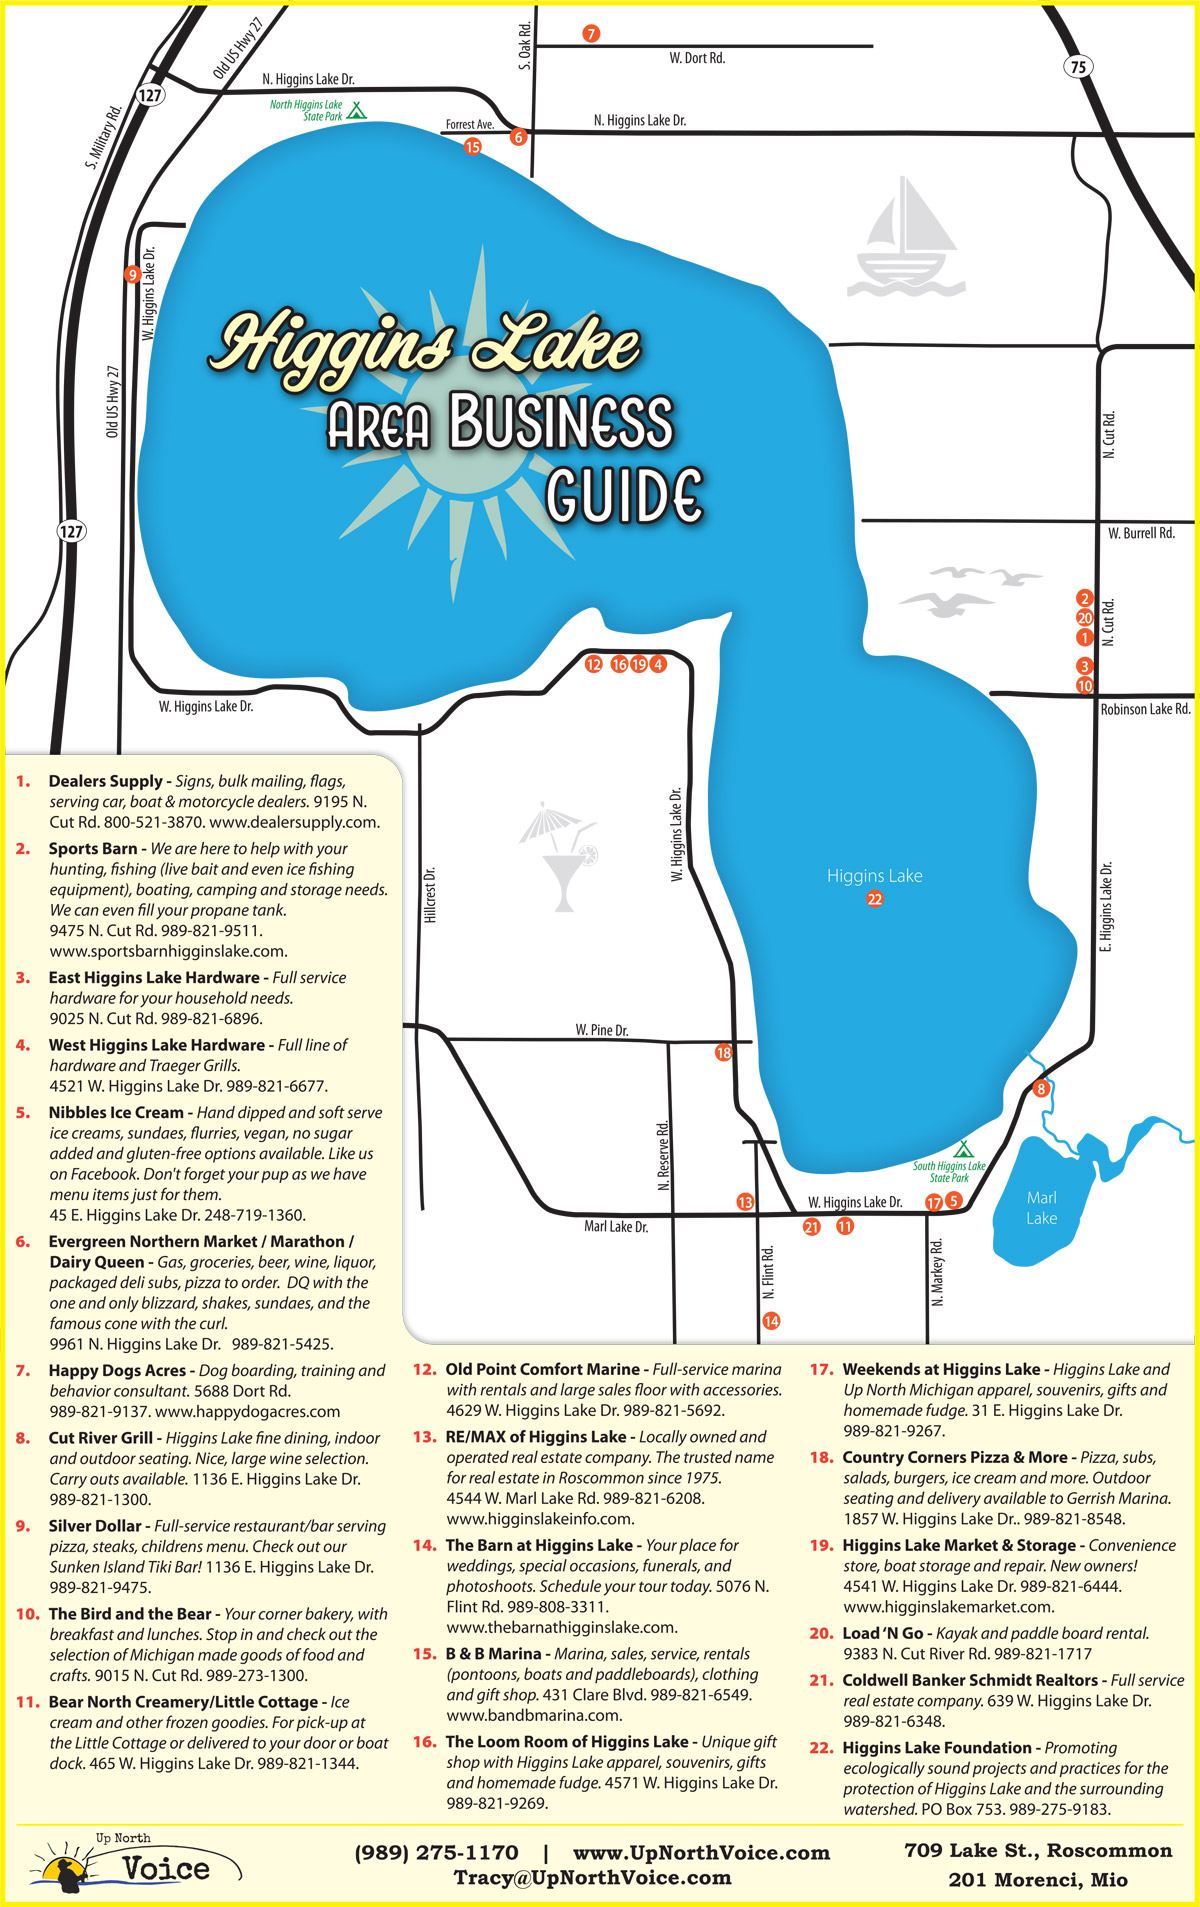 Higgins Lake Area Business Guide